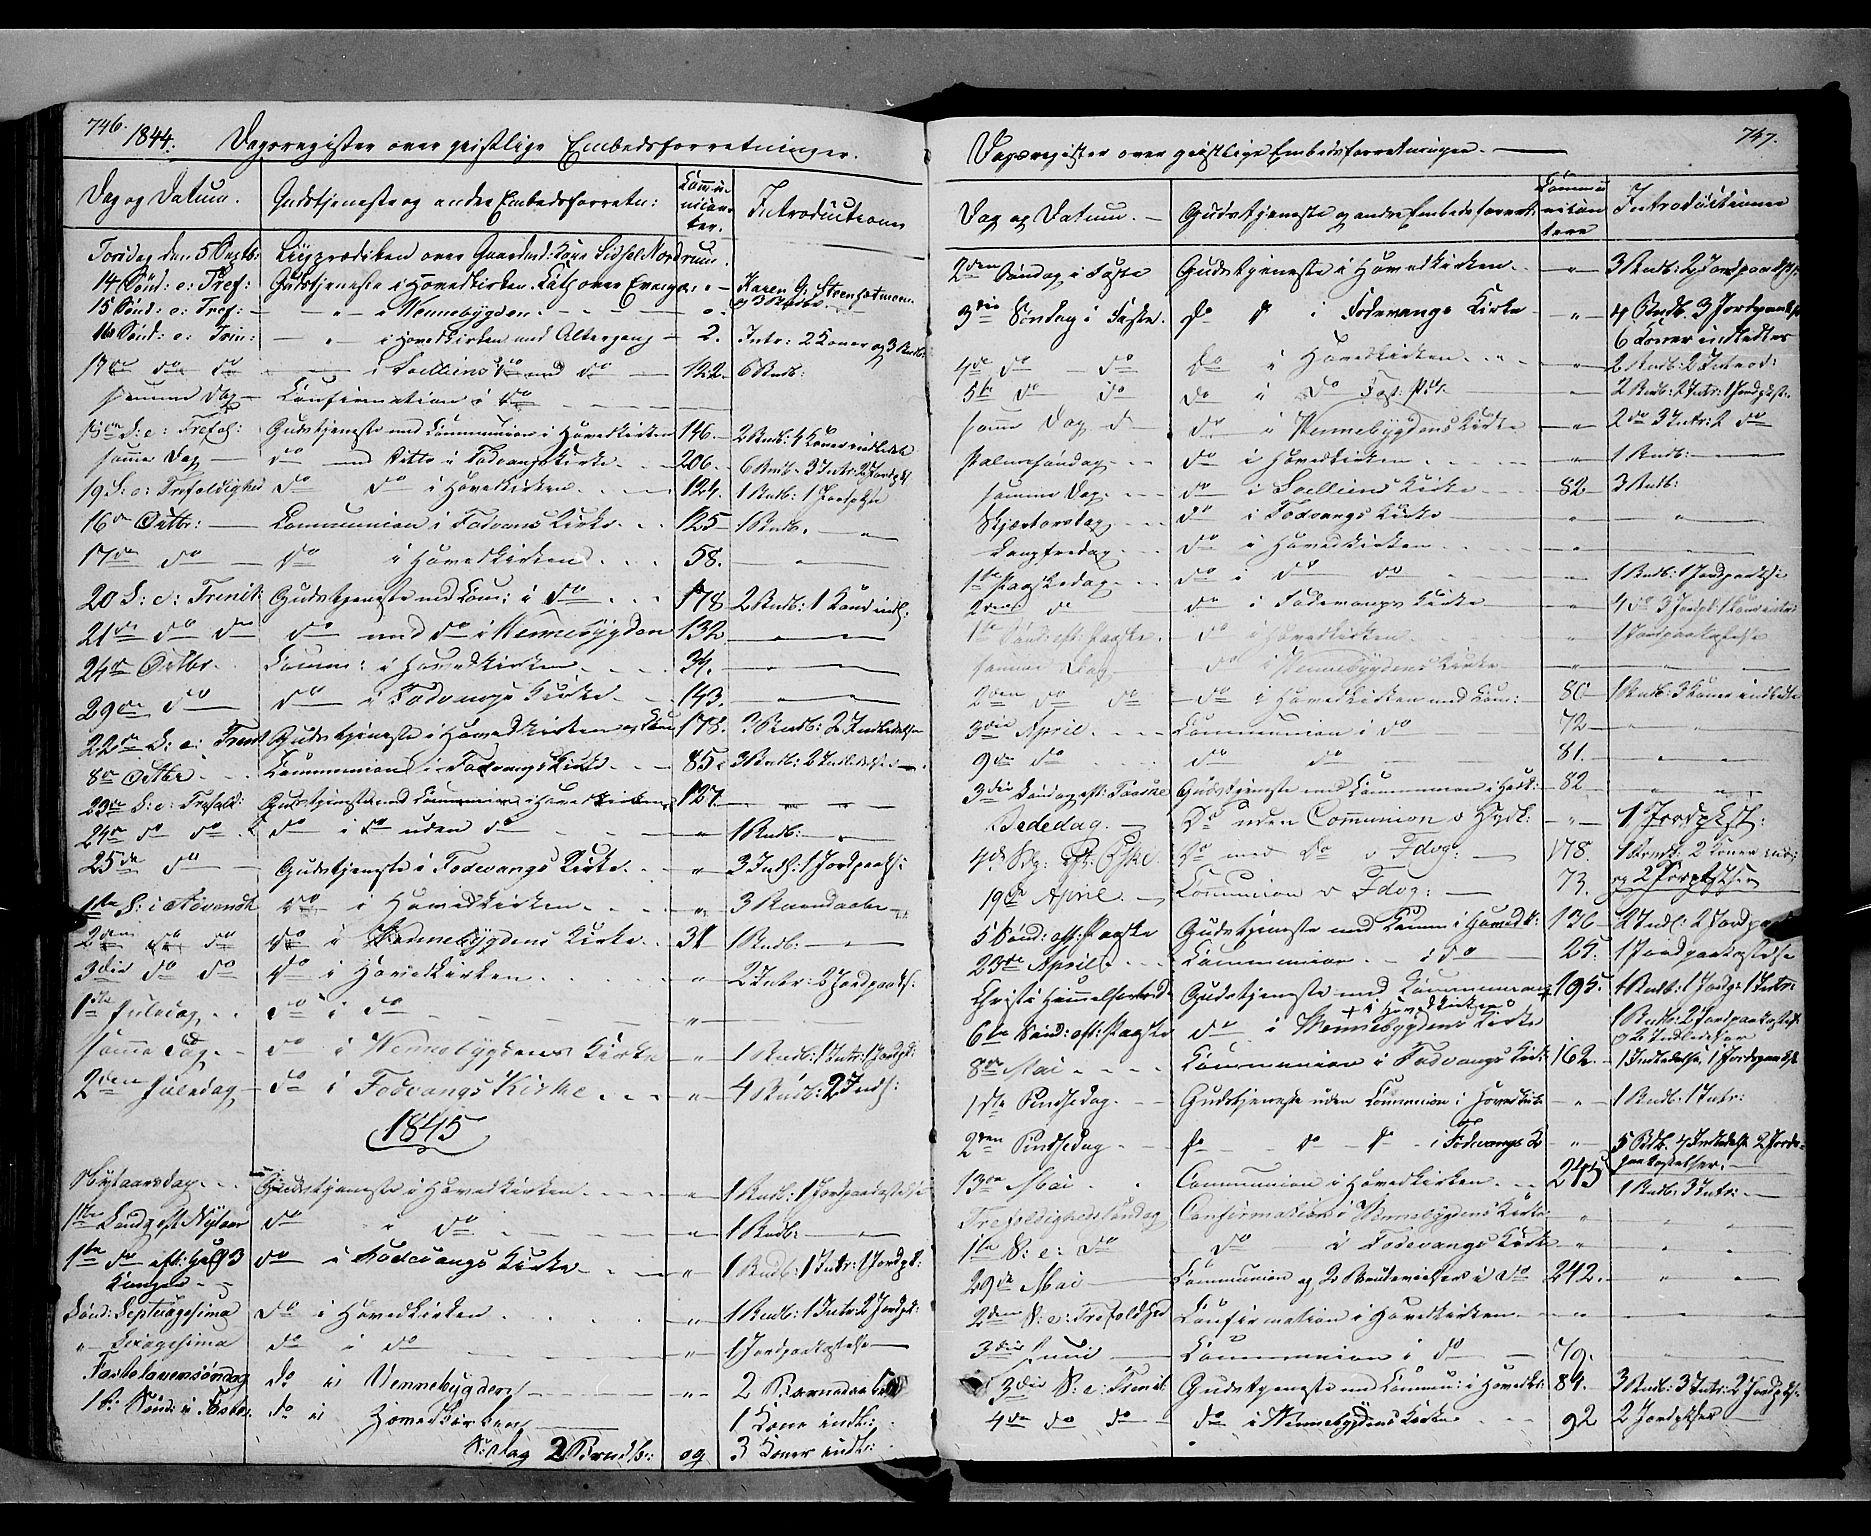 SAH, Ringebu prestekontor, Ministerialbok nr. 5, 1839-1848, s. 746-747